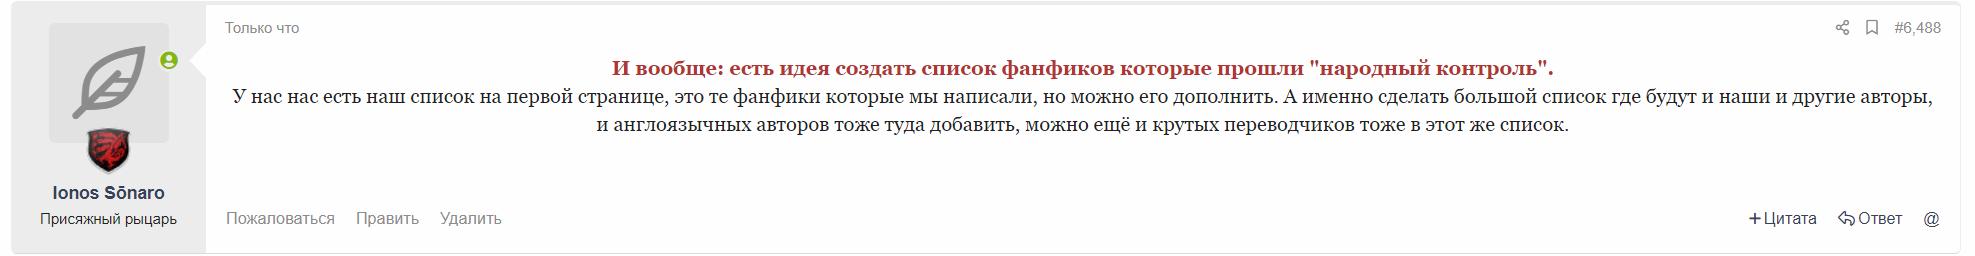 https://i5.imageban.ru/out/2020/06/24/a6ec83e8ce744368d442d77a43d06b2b.png